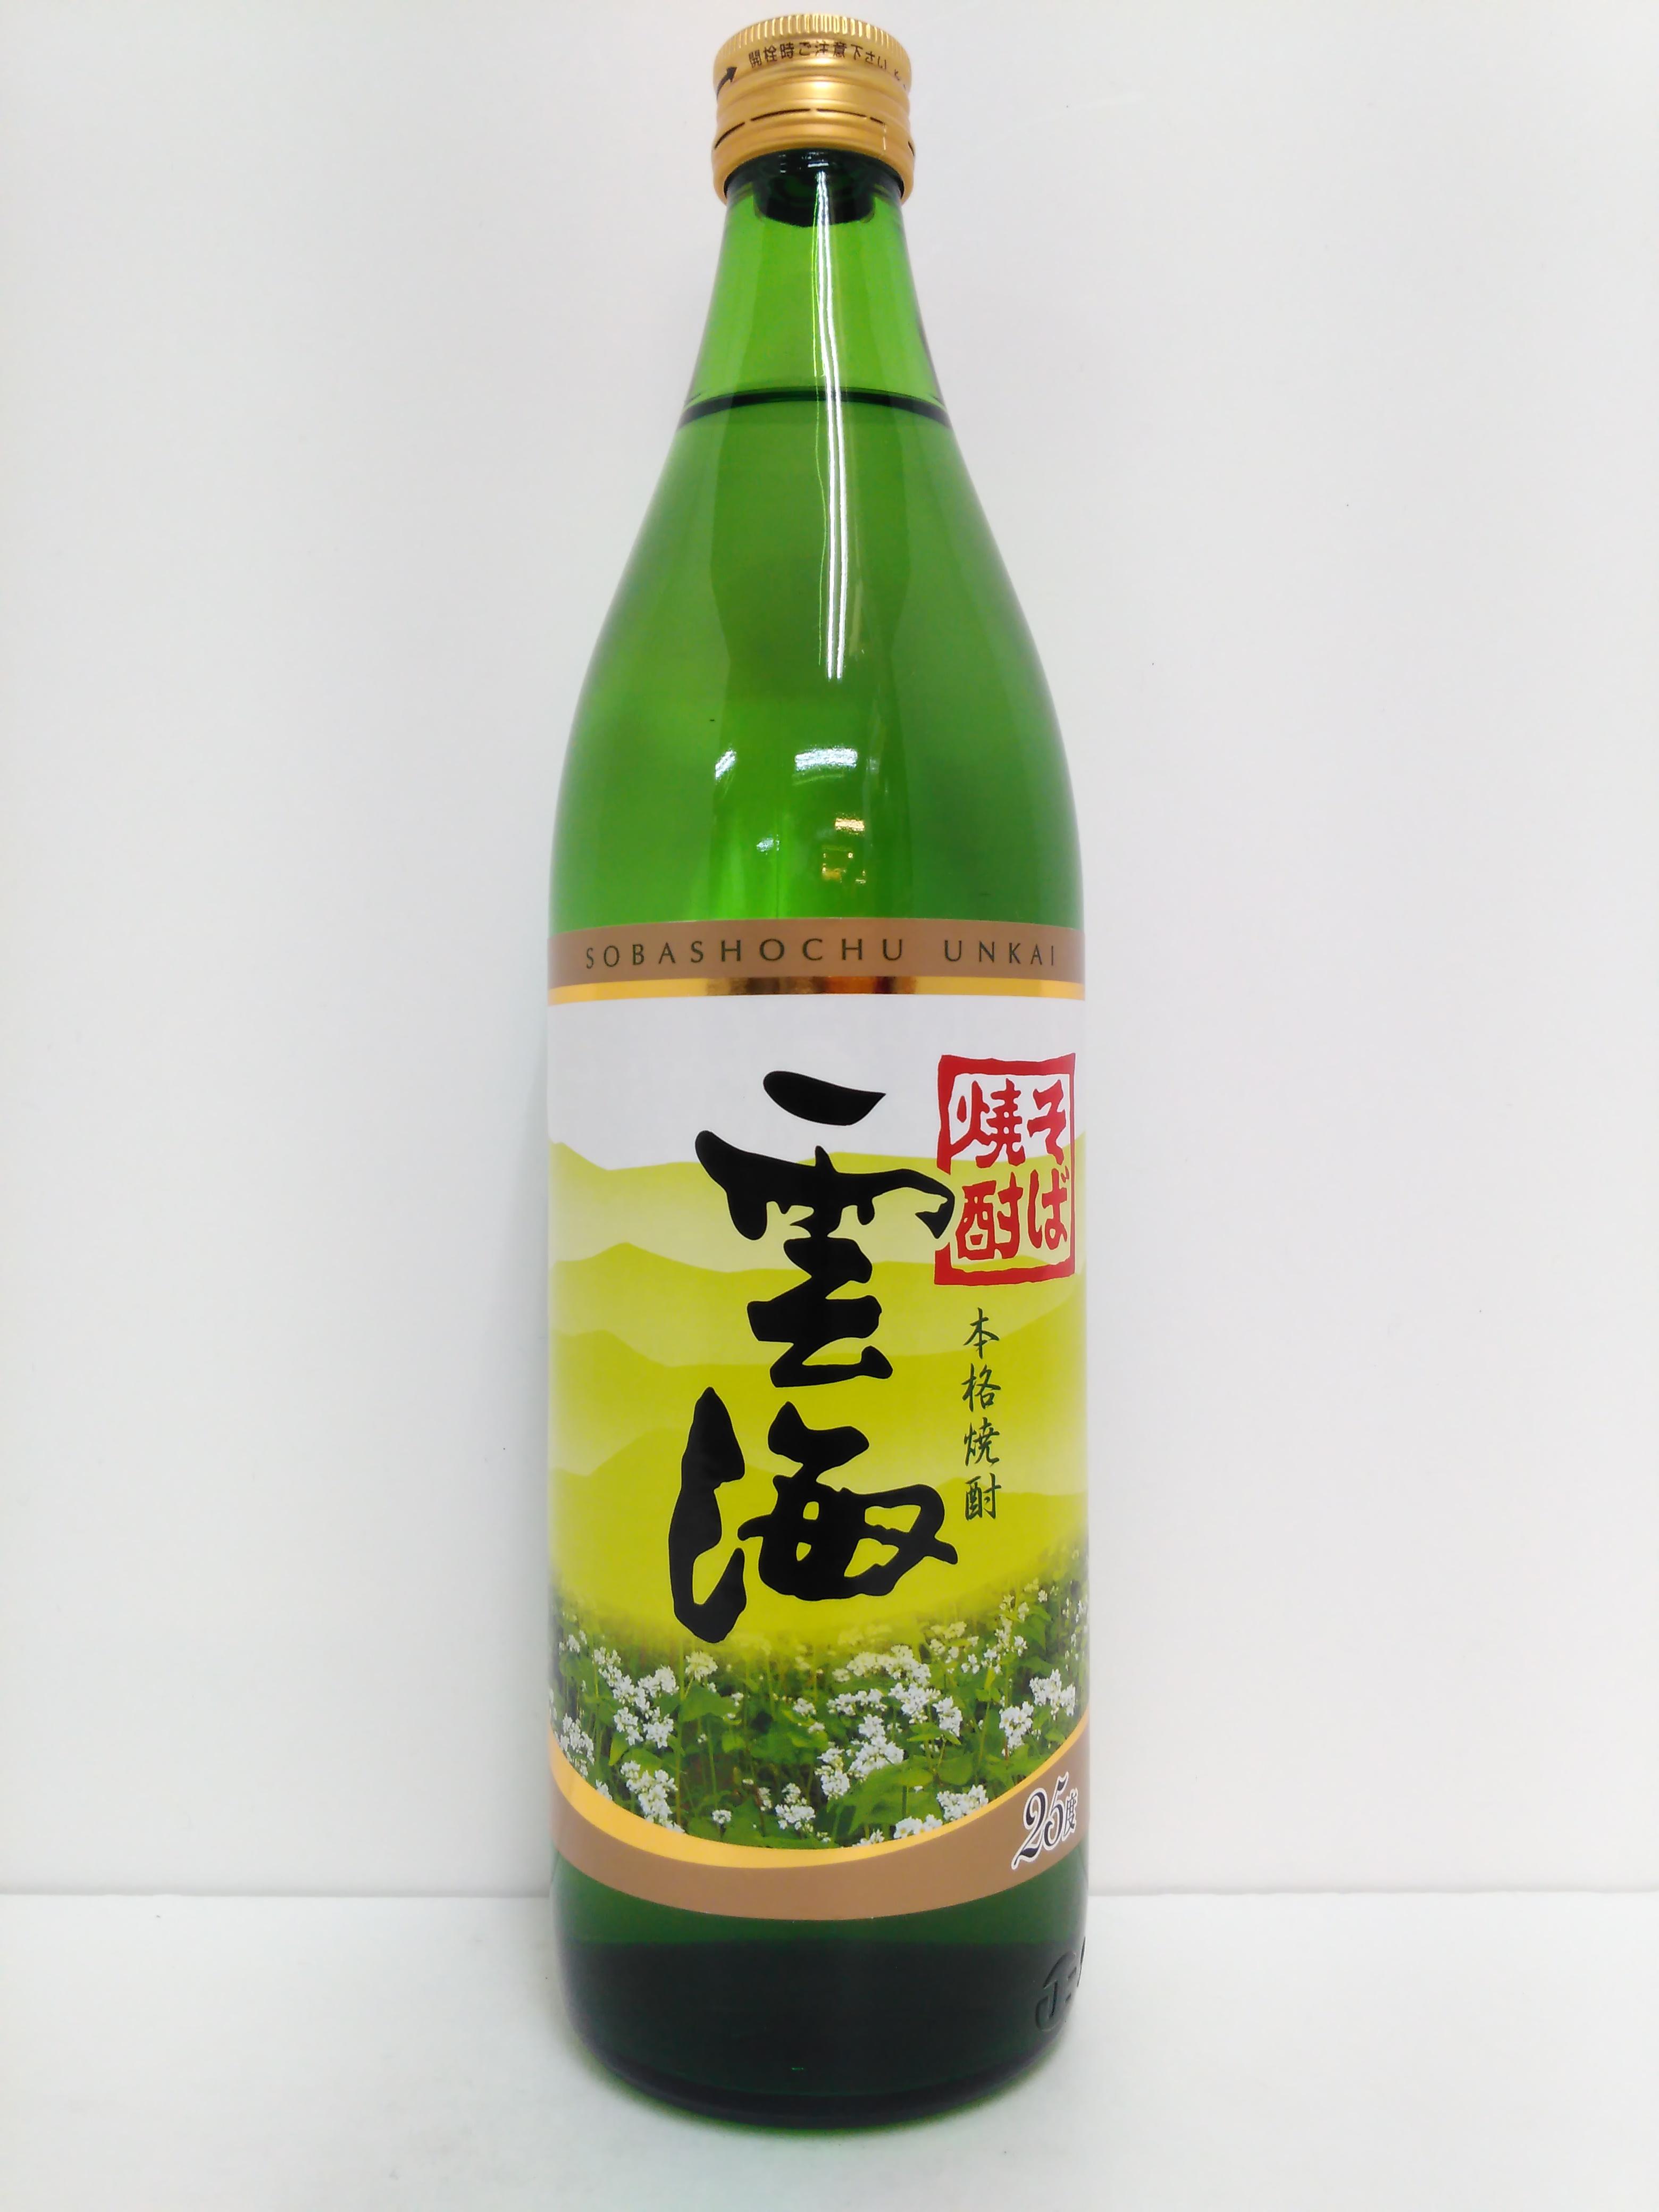 【TAKEYAスマイル便 対象品】雲海 そば焼酎 25度 900ml瓶